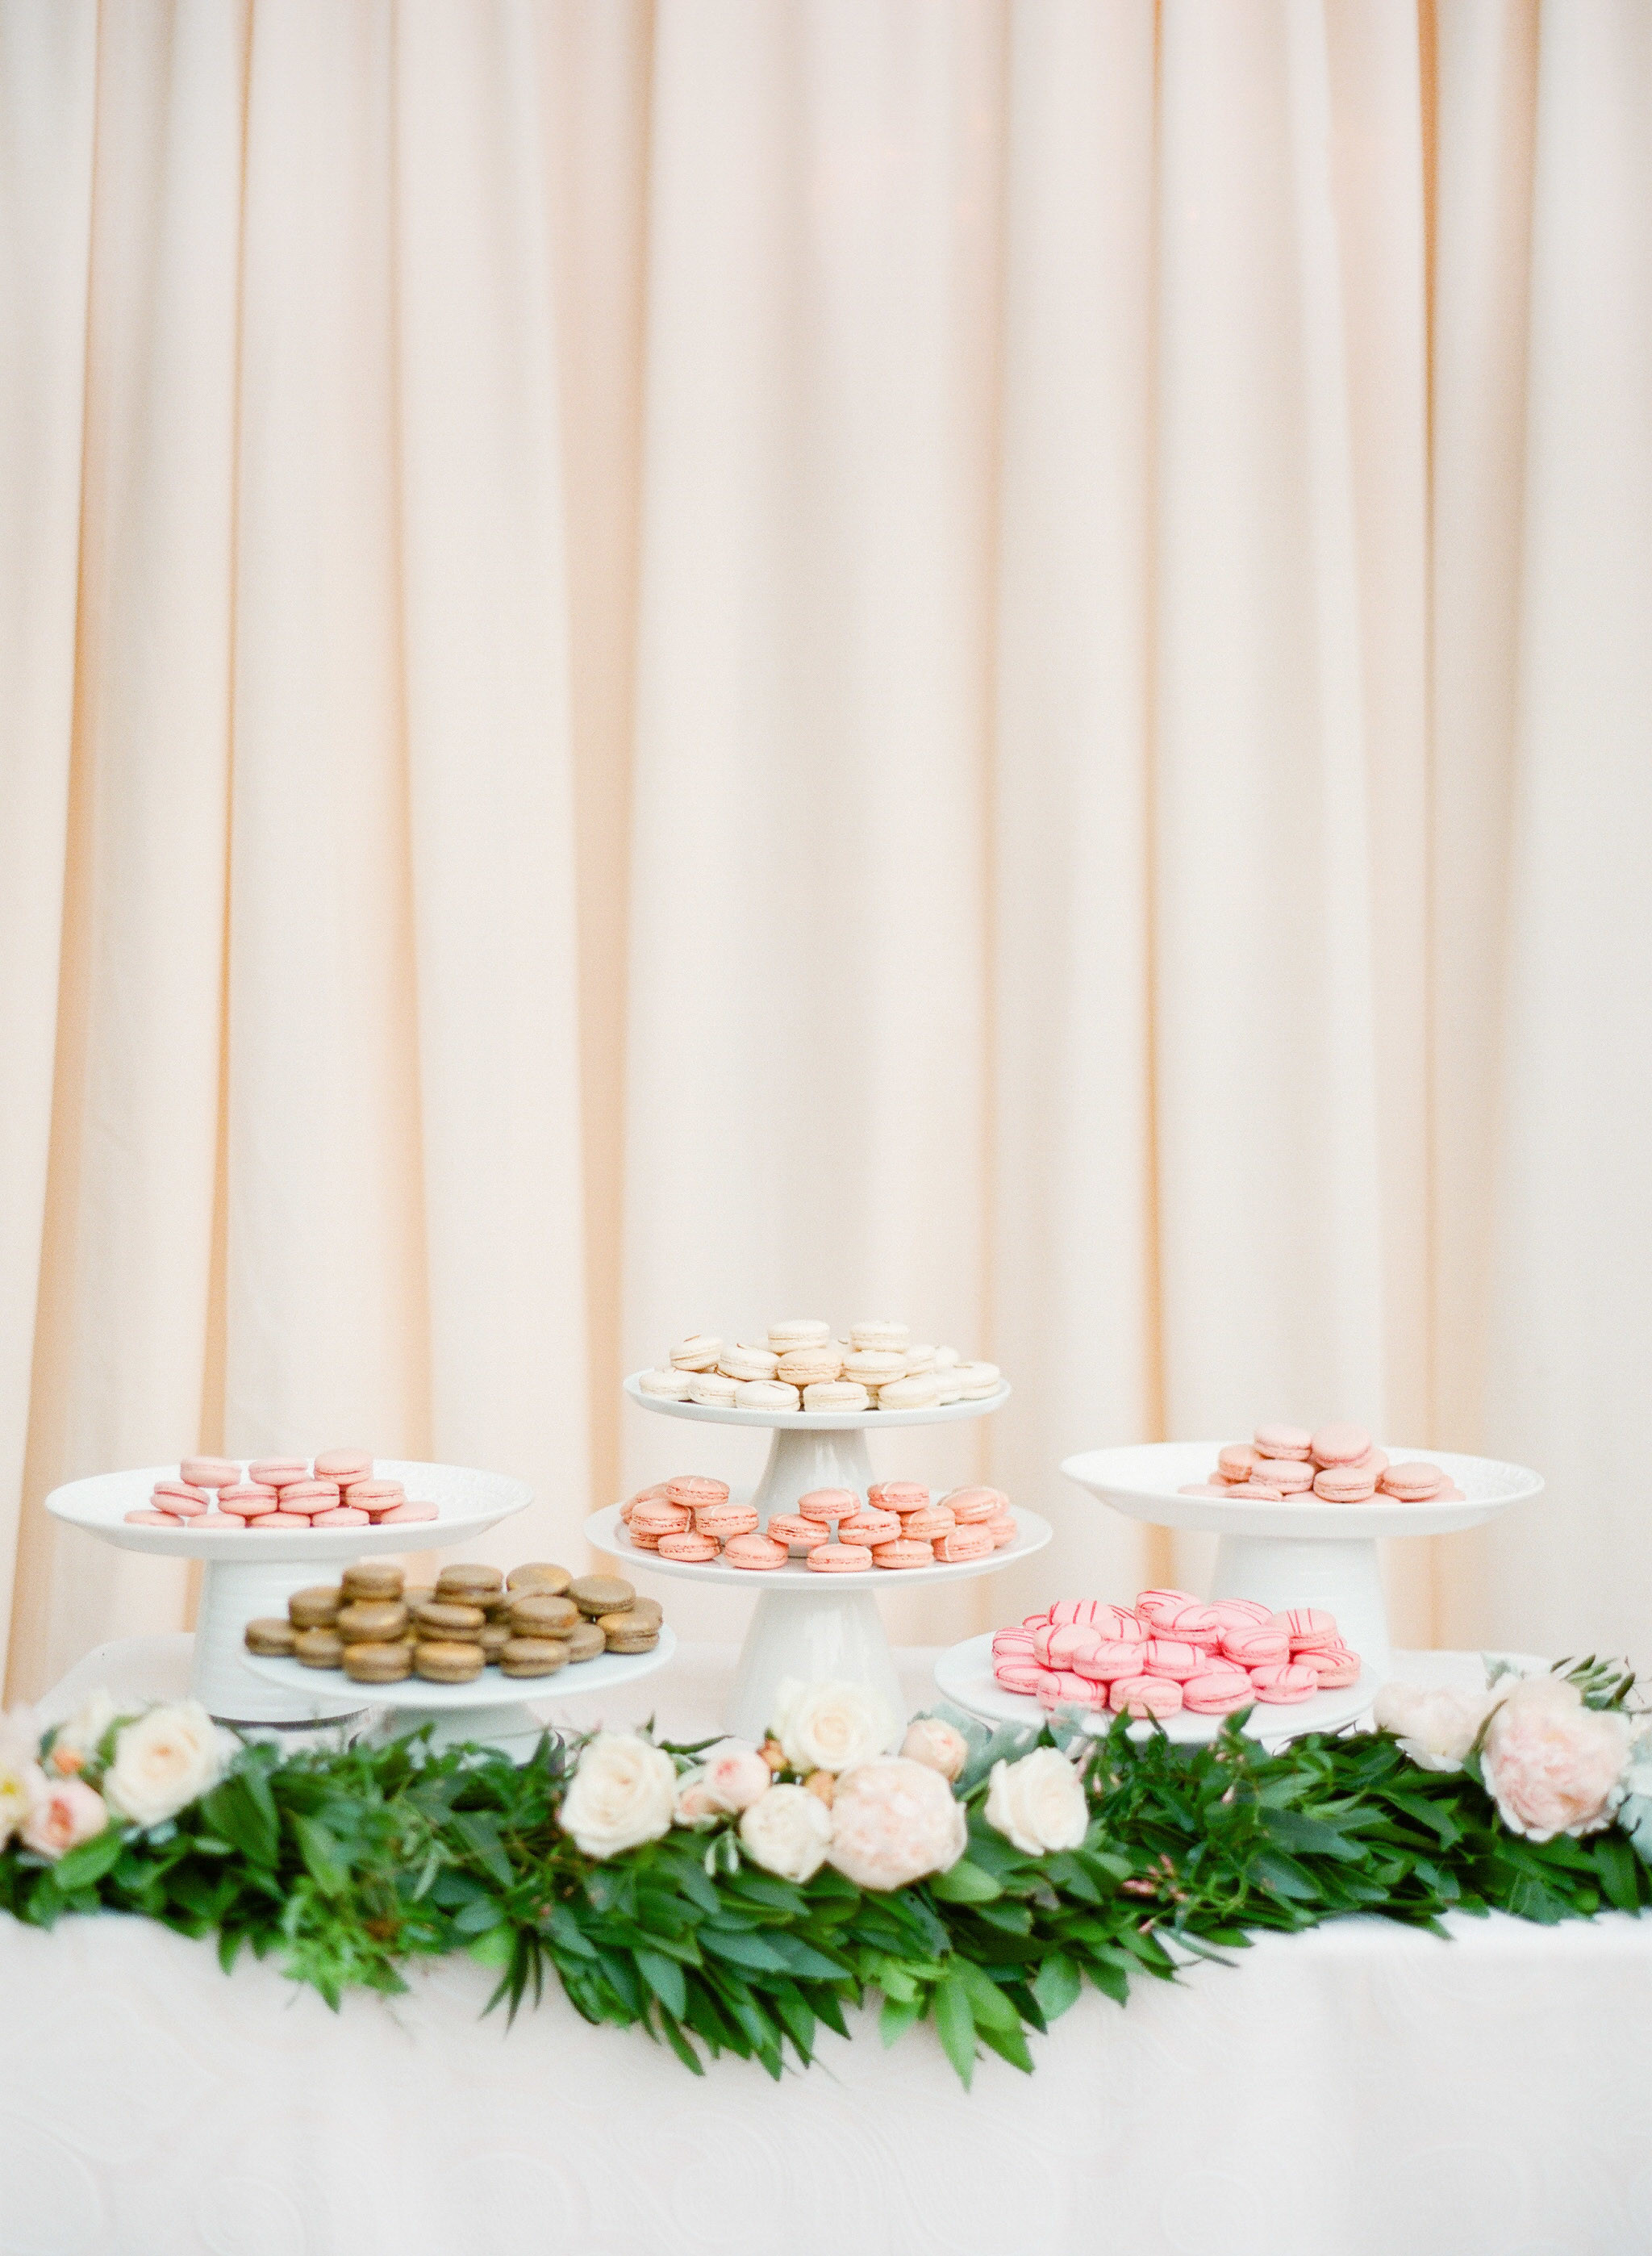 bridal shower food table